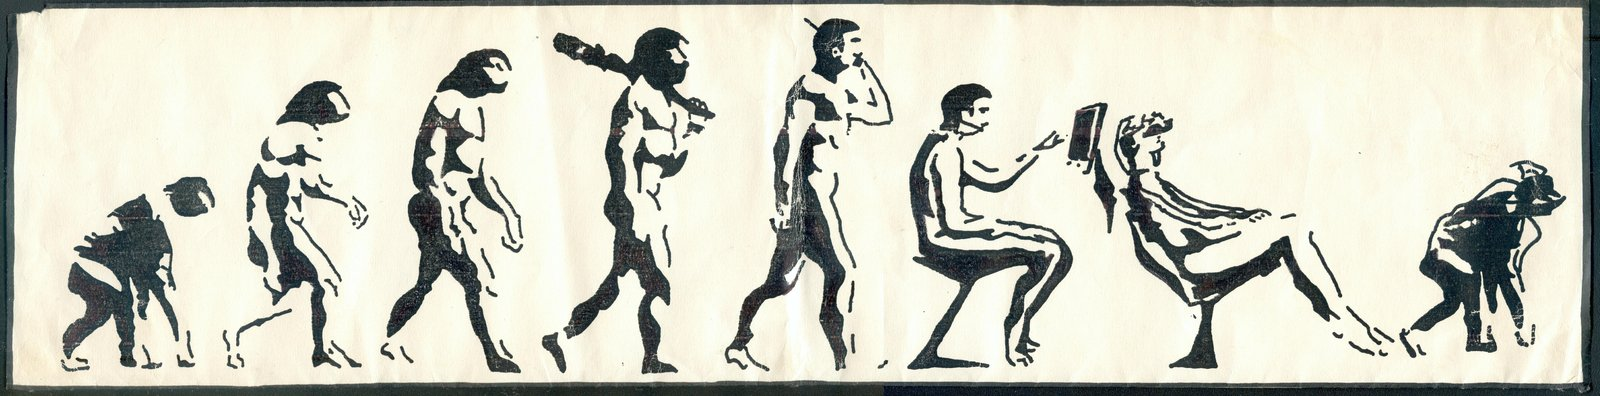 Human_evolution_by_manleo